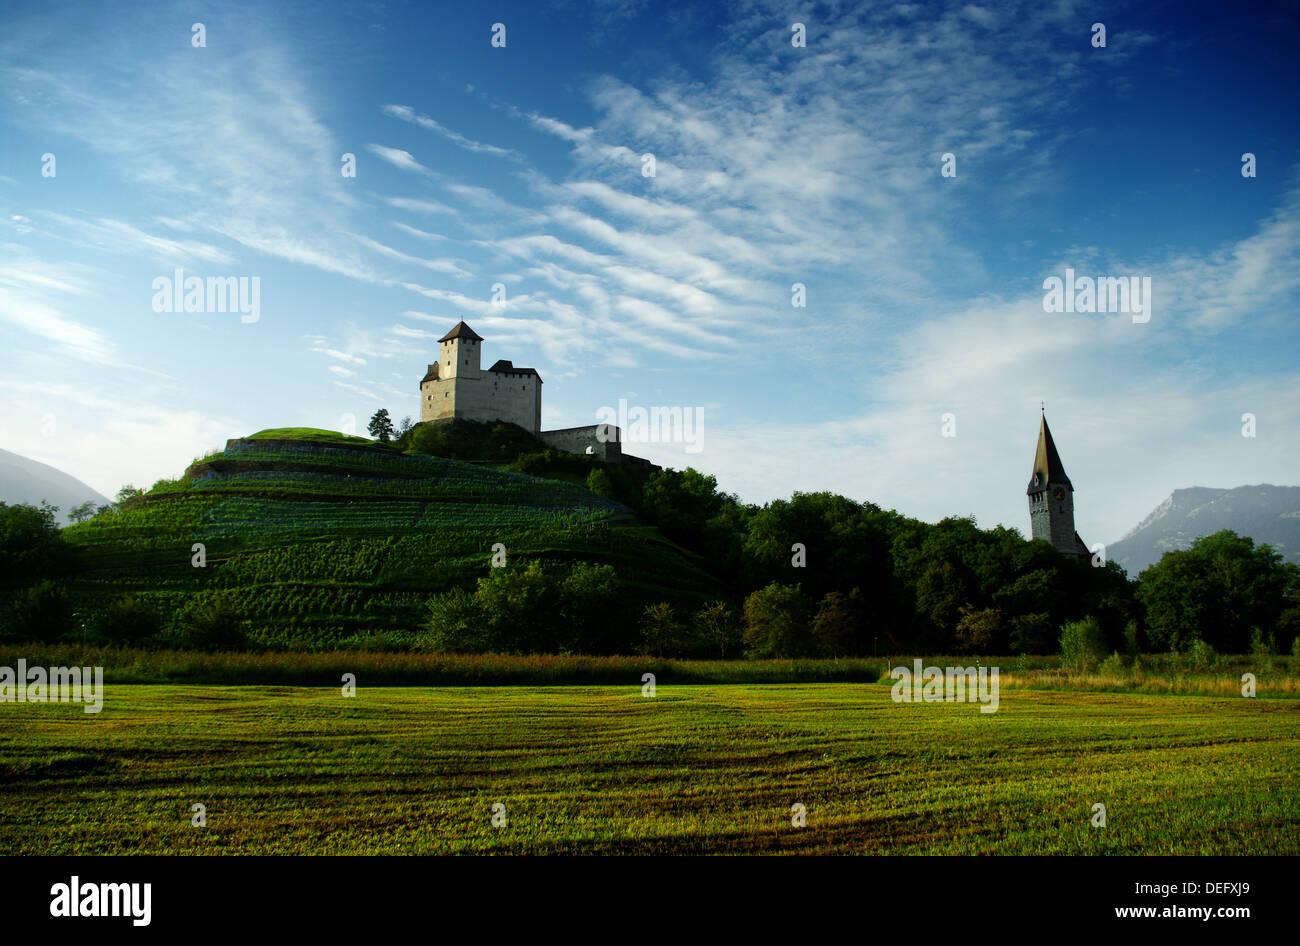 Castle on top of a hill in Liechtenstein Stock Photo